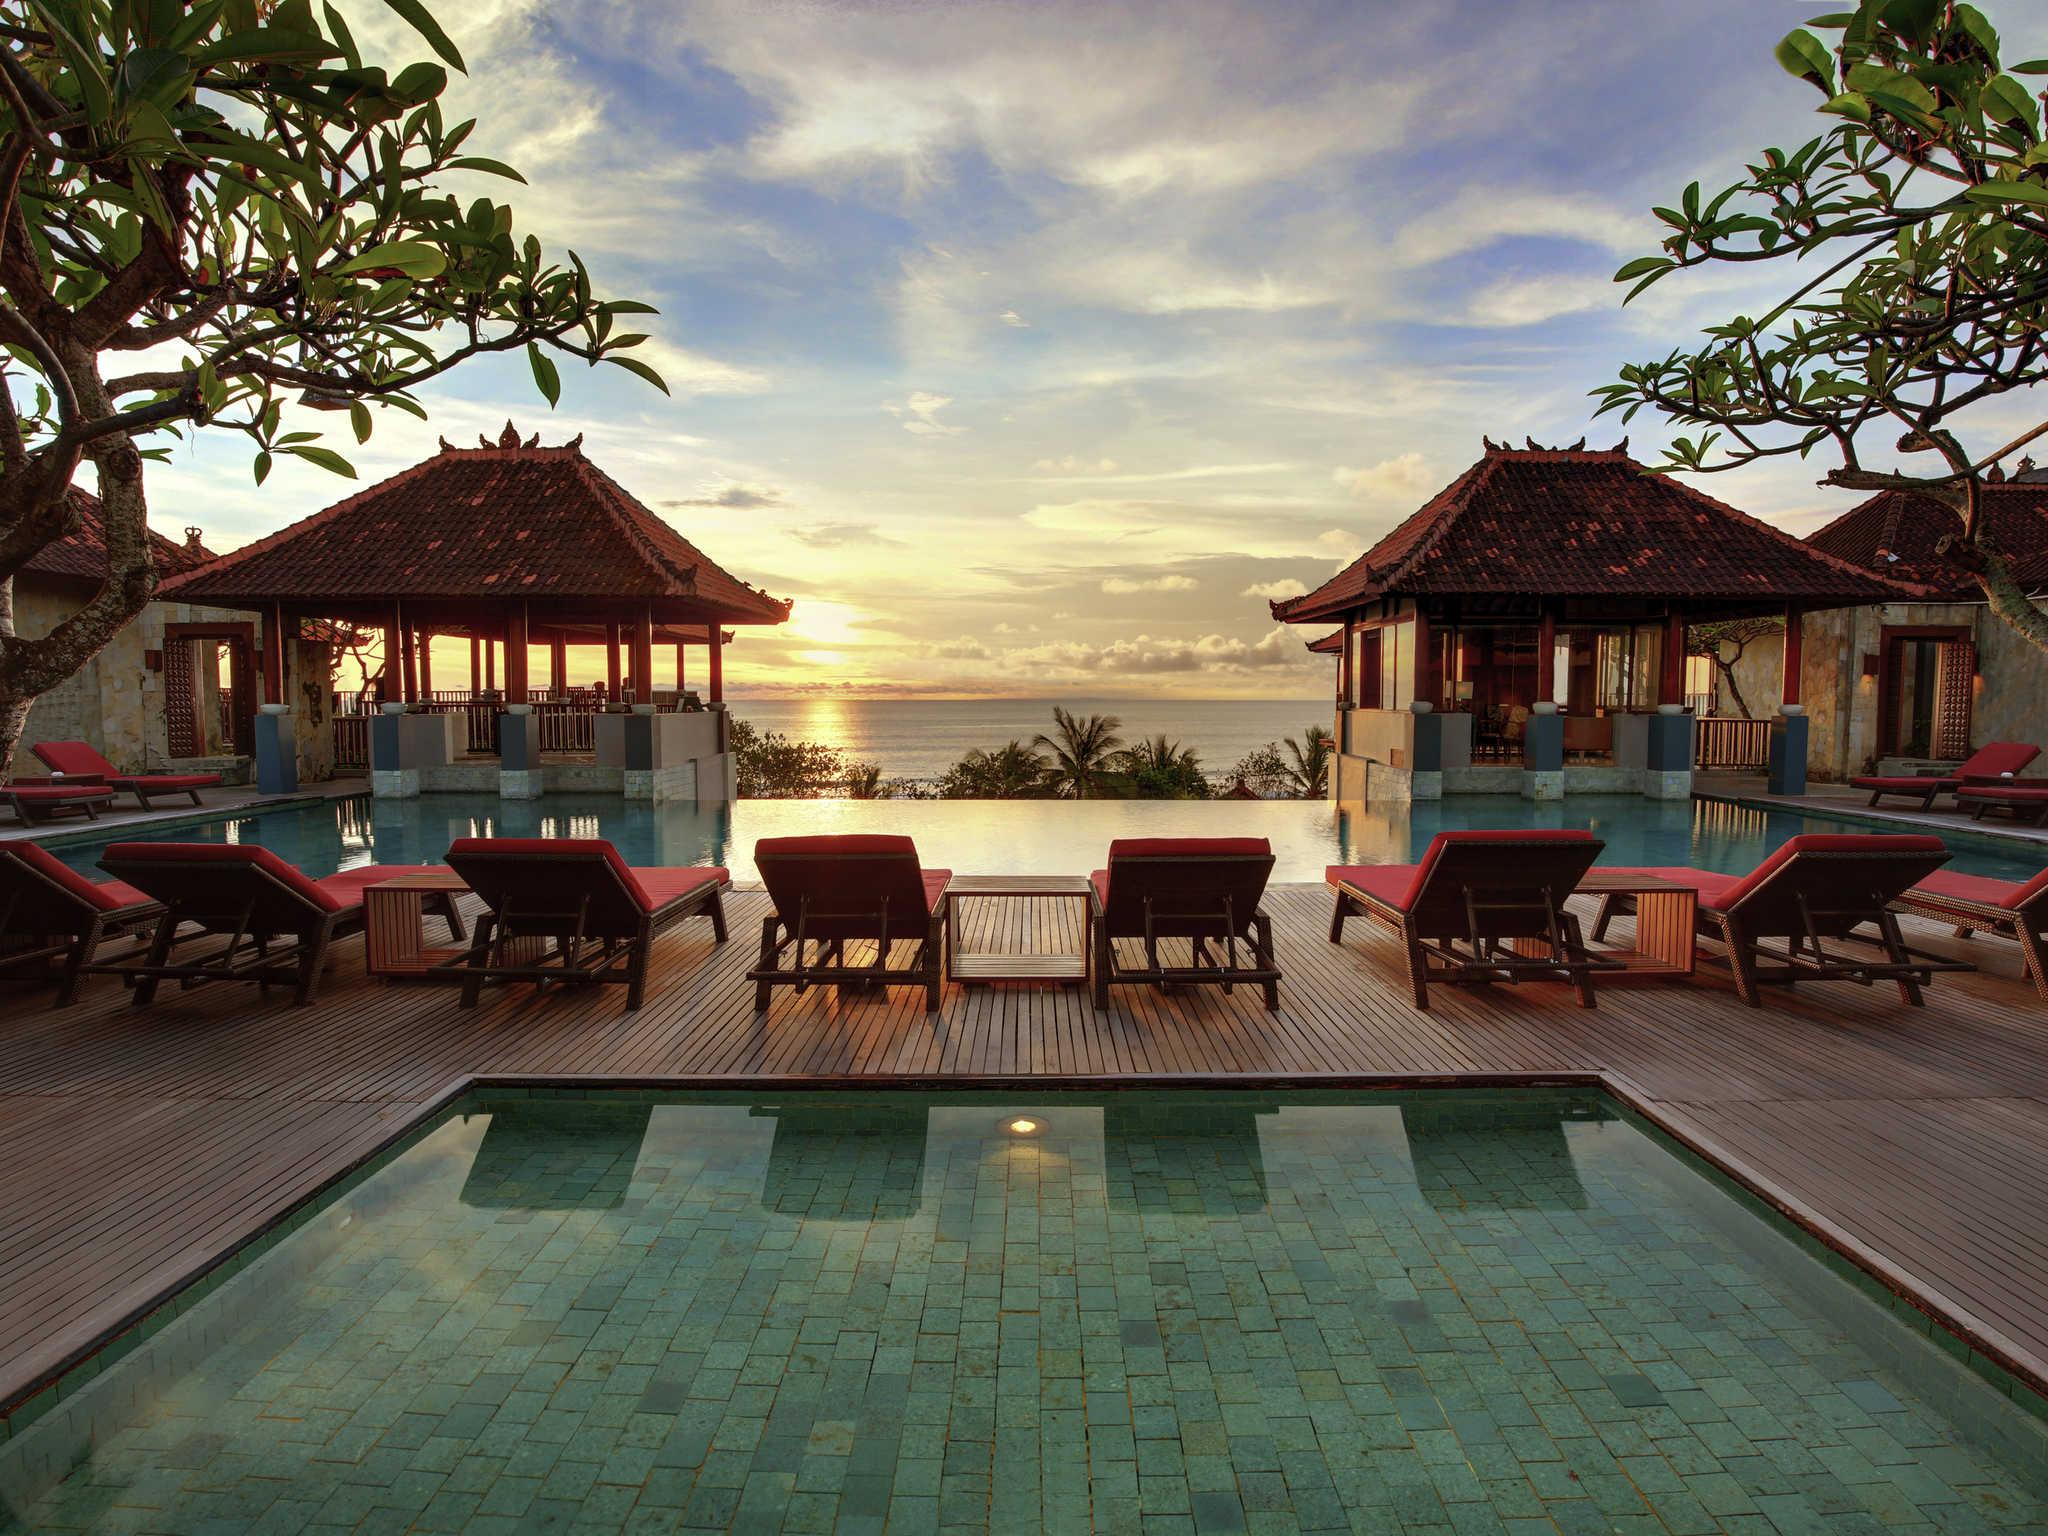 Hotel in Kuta Bali - Kuta Paradiso Hotel (The Official